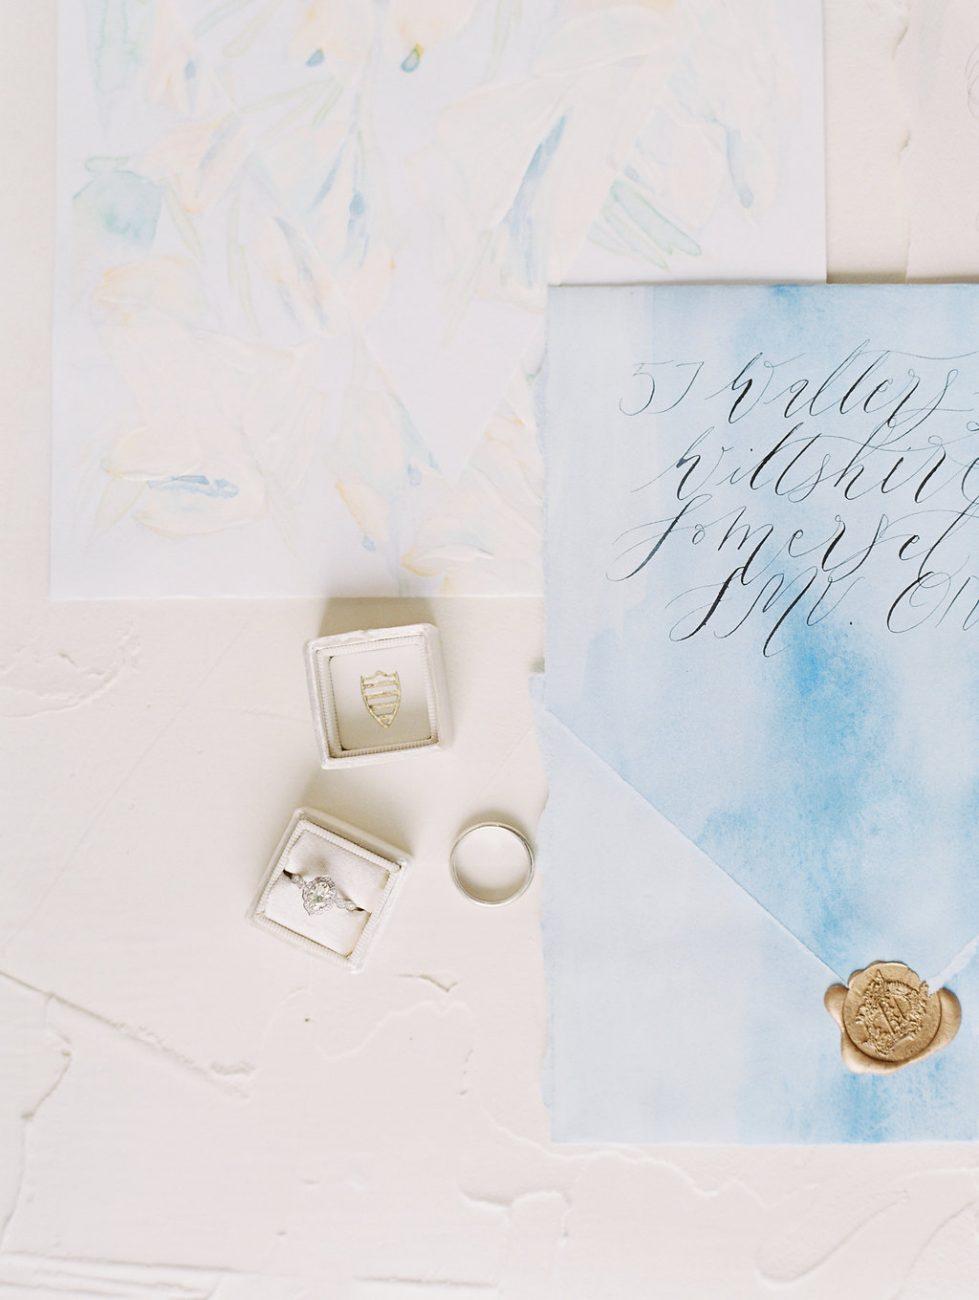 Watercolour wedding invitations envelopes